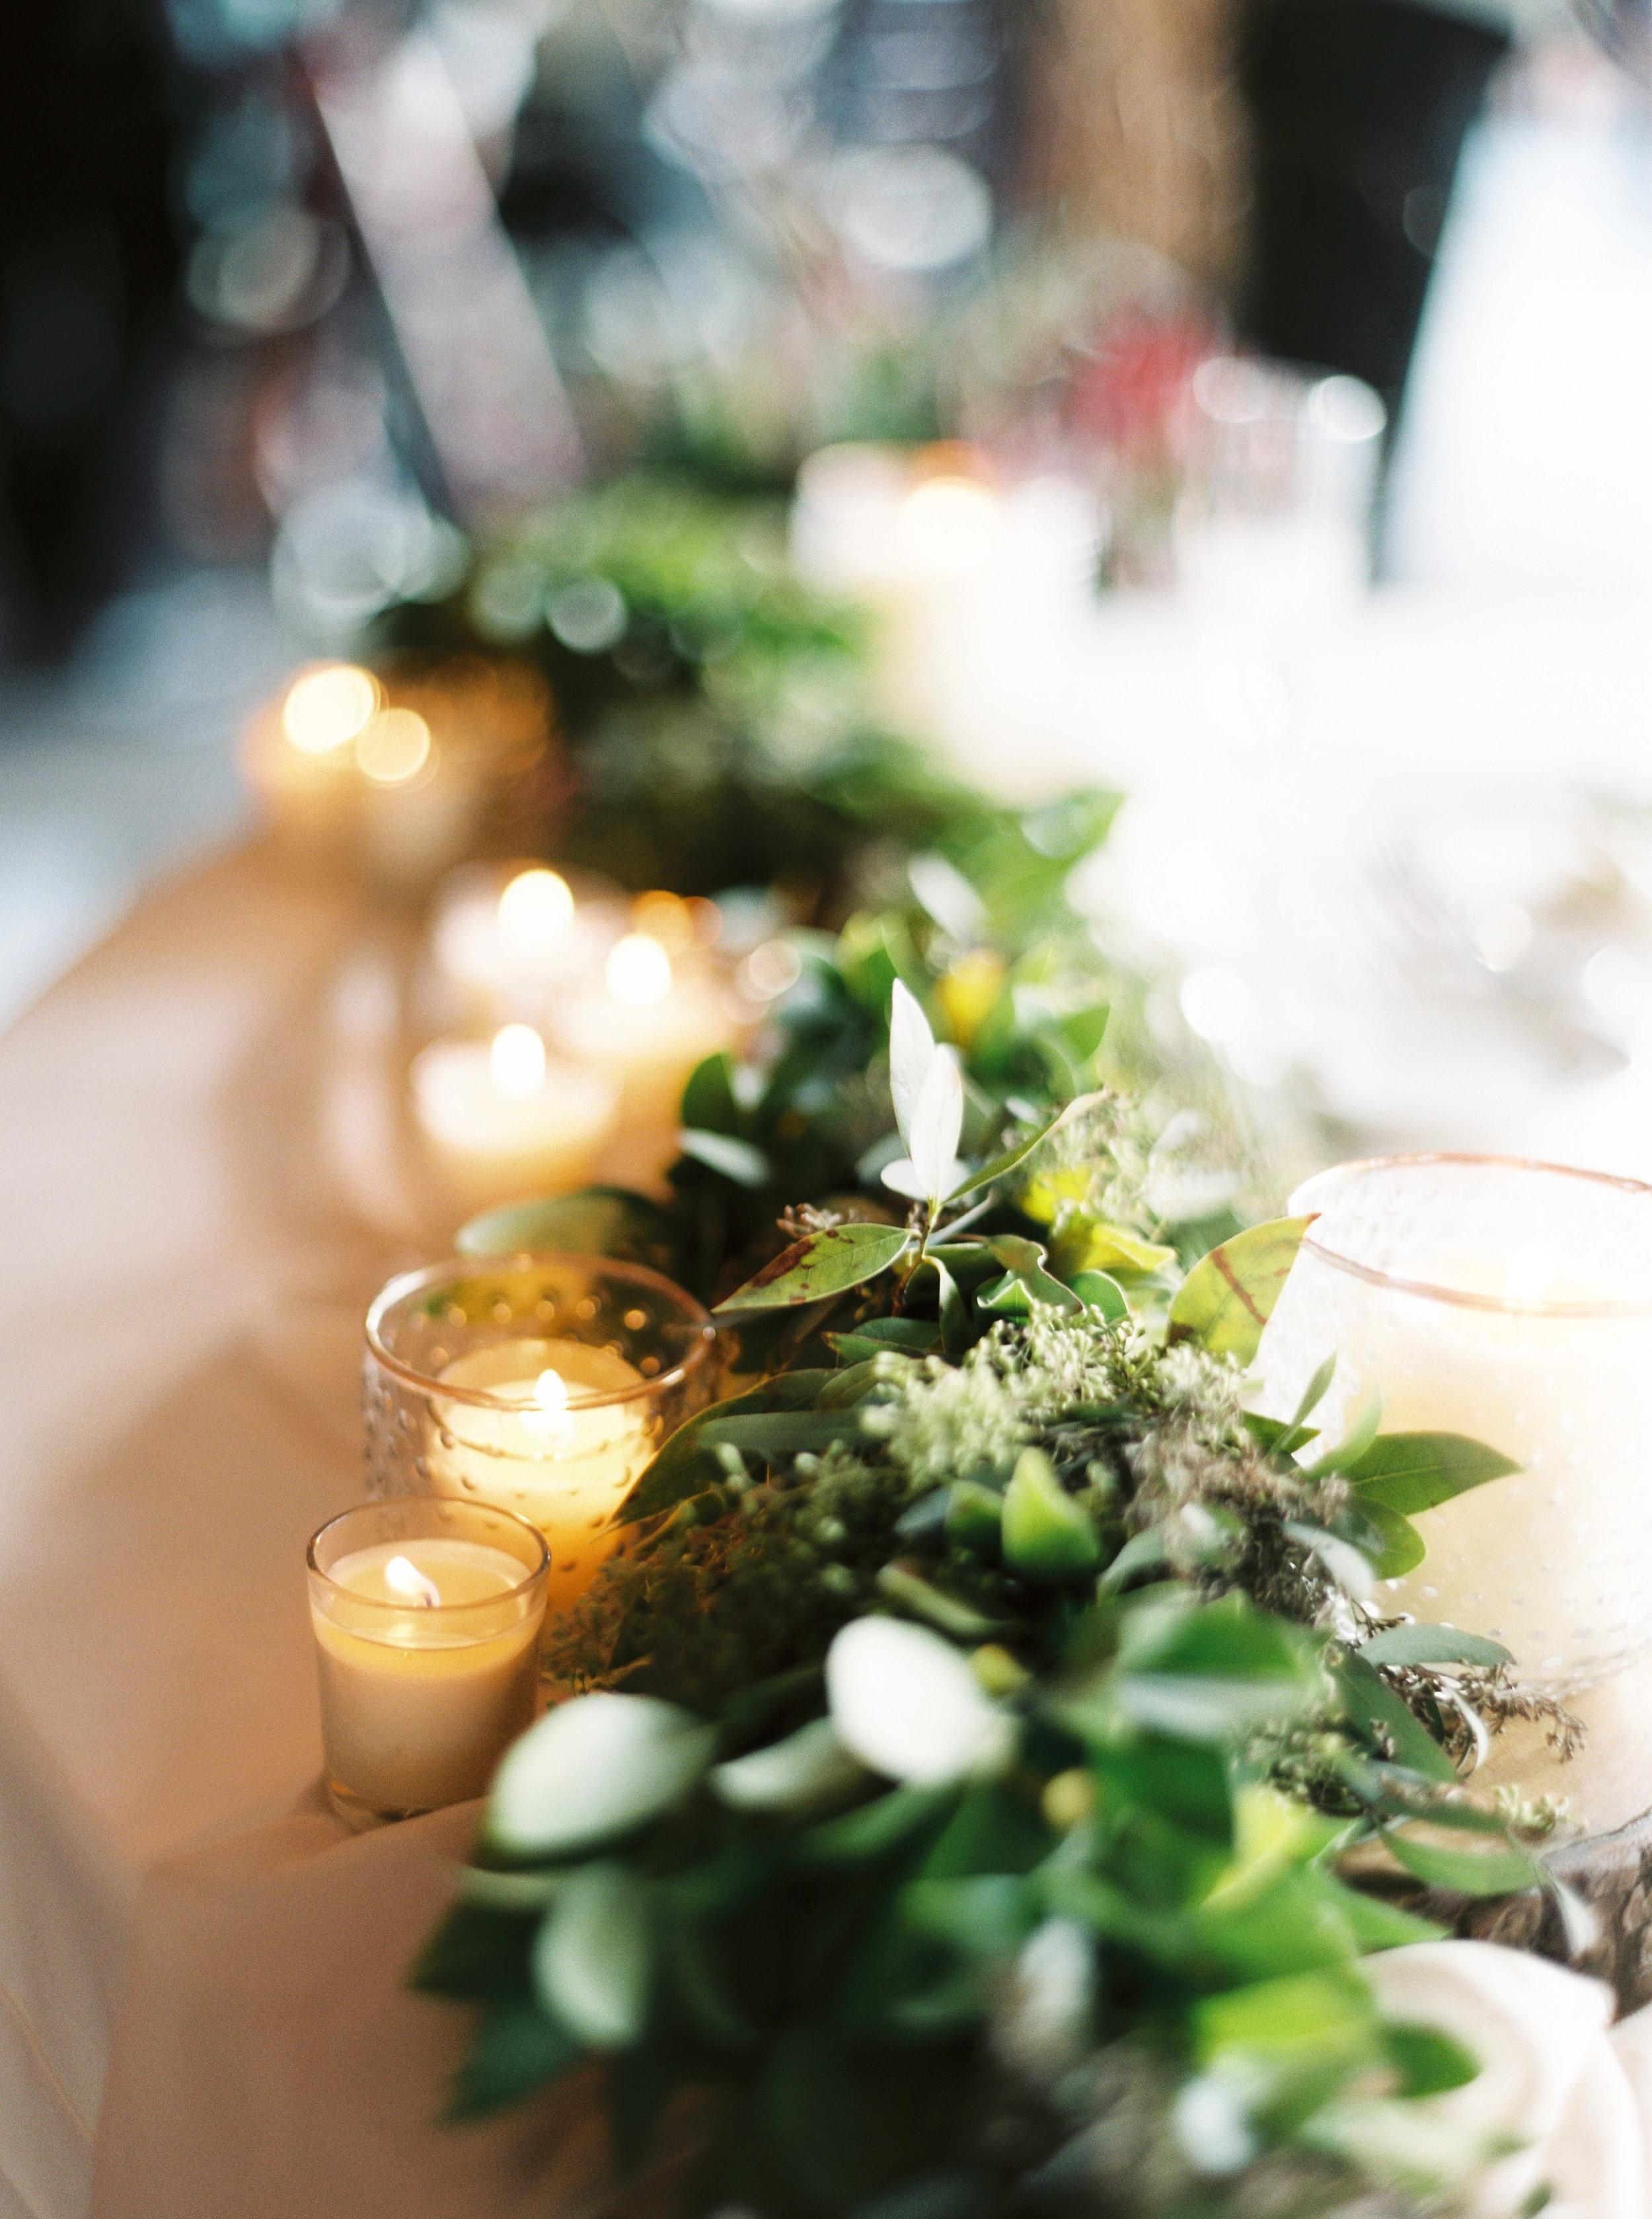 Tenaya-lodge-wedding-at-yosemite-national-park-california-51.jpg